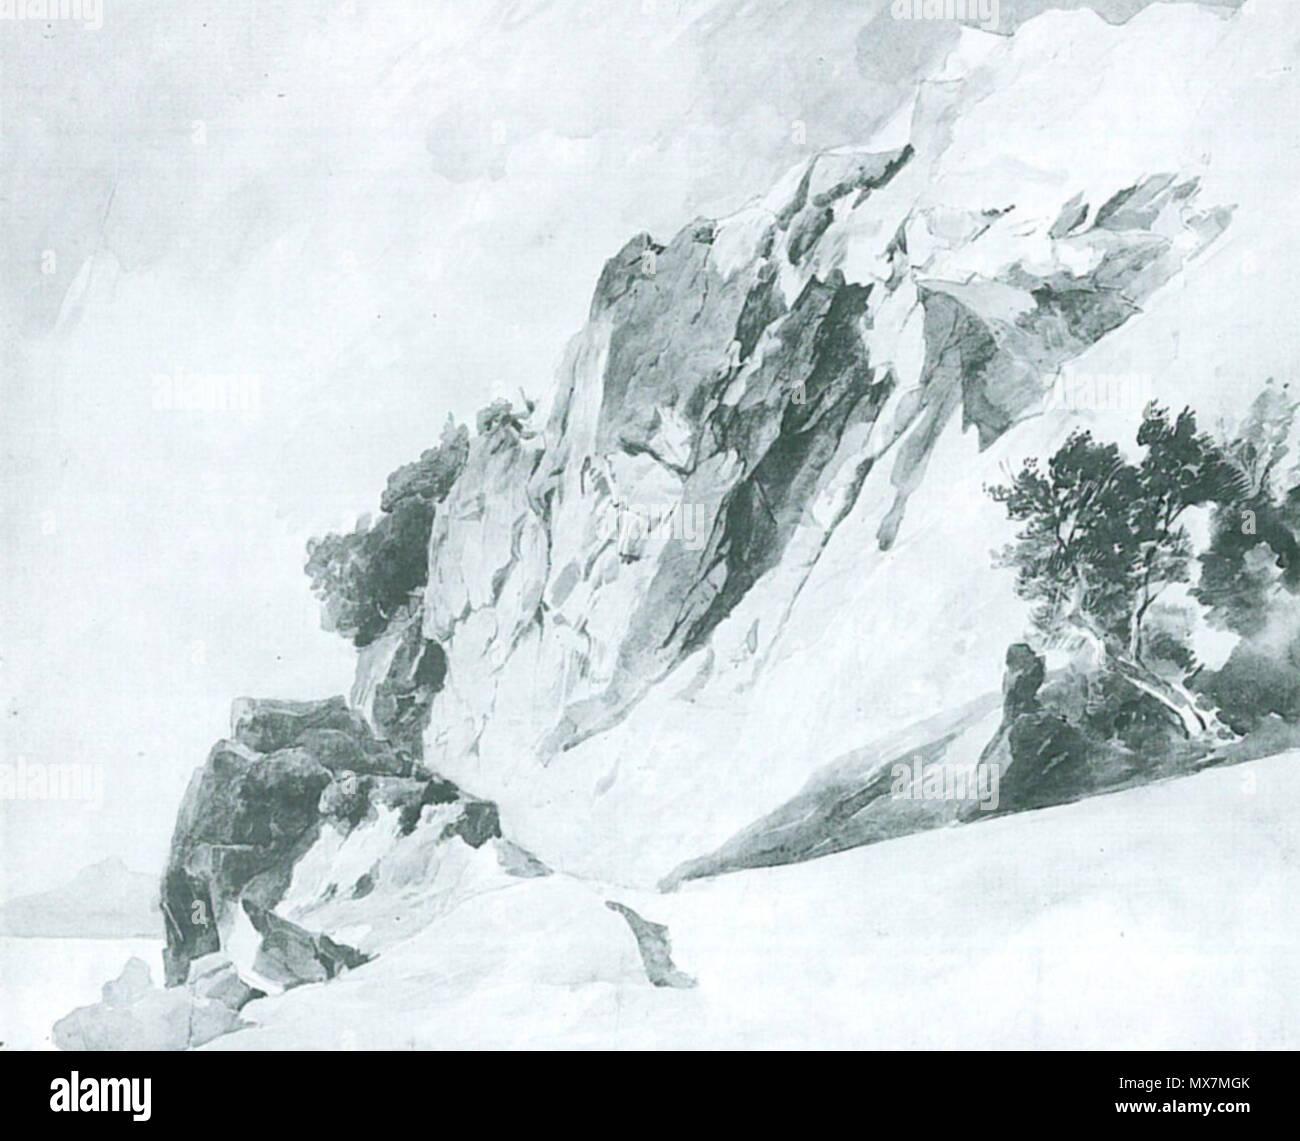 . Deutsch: Edmund Kanoldt: Felsen am Meer. 48 × 61 cm. Aquarell über Bleistift auf Papier. La Kunsthalle di Mannheim . circa 1890. Edmund Kanoldt (1845-1904) 178 Edmund Kanoldt Felsen am Meer Immagini Stock